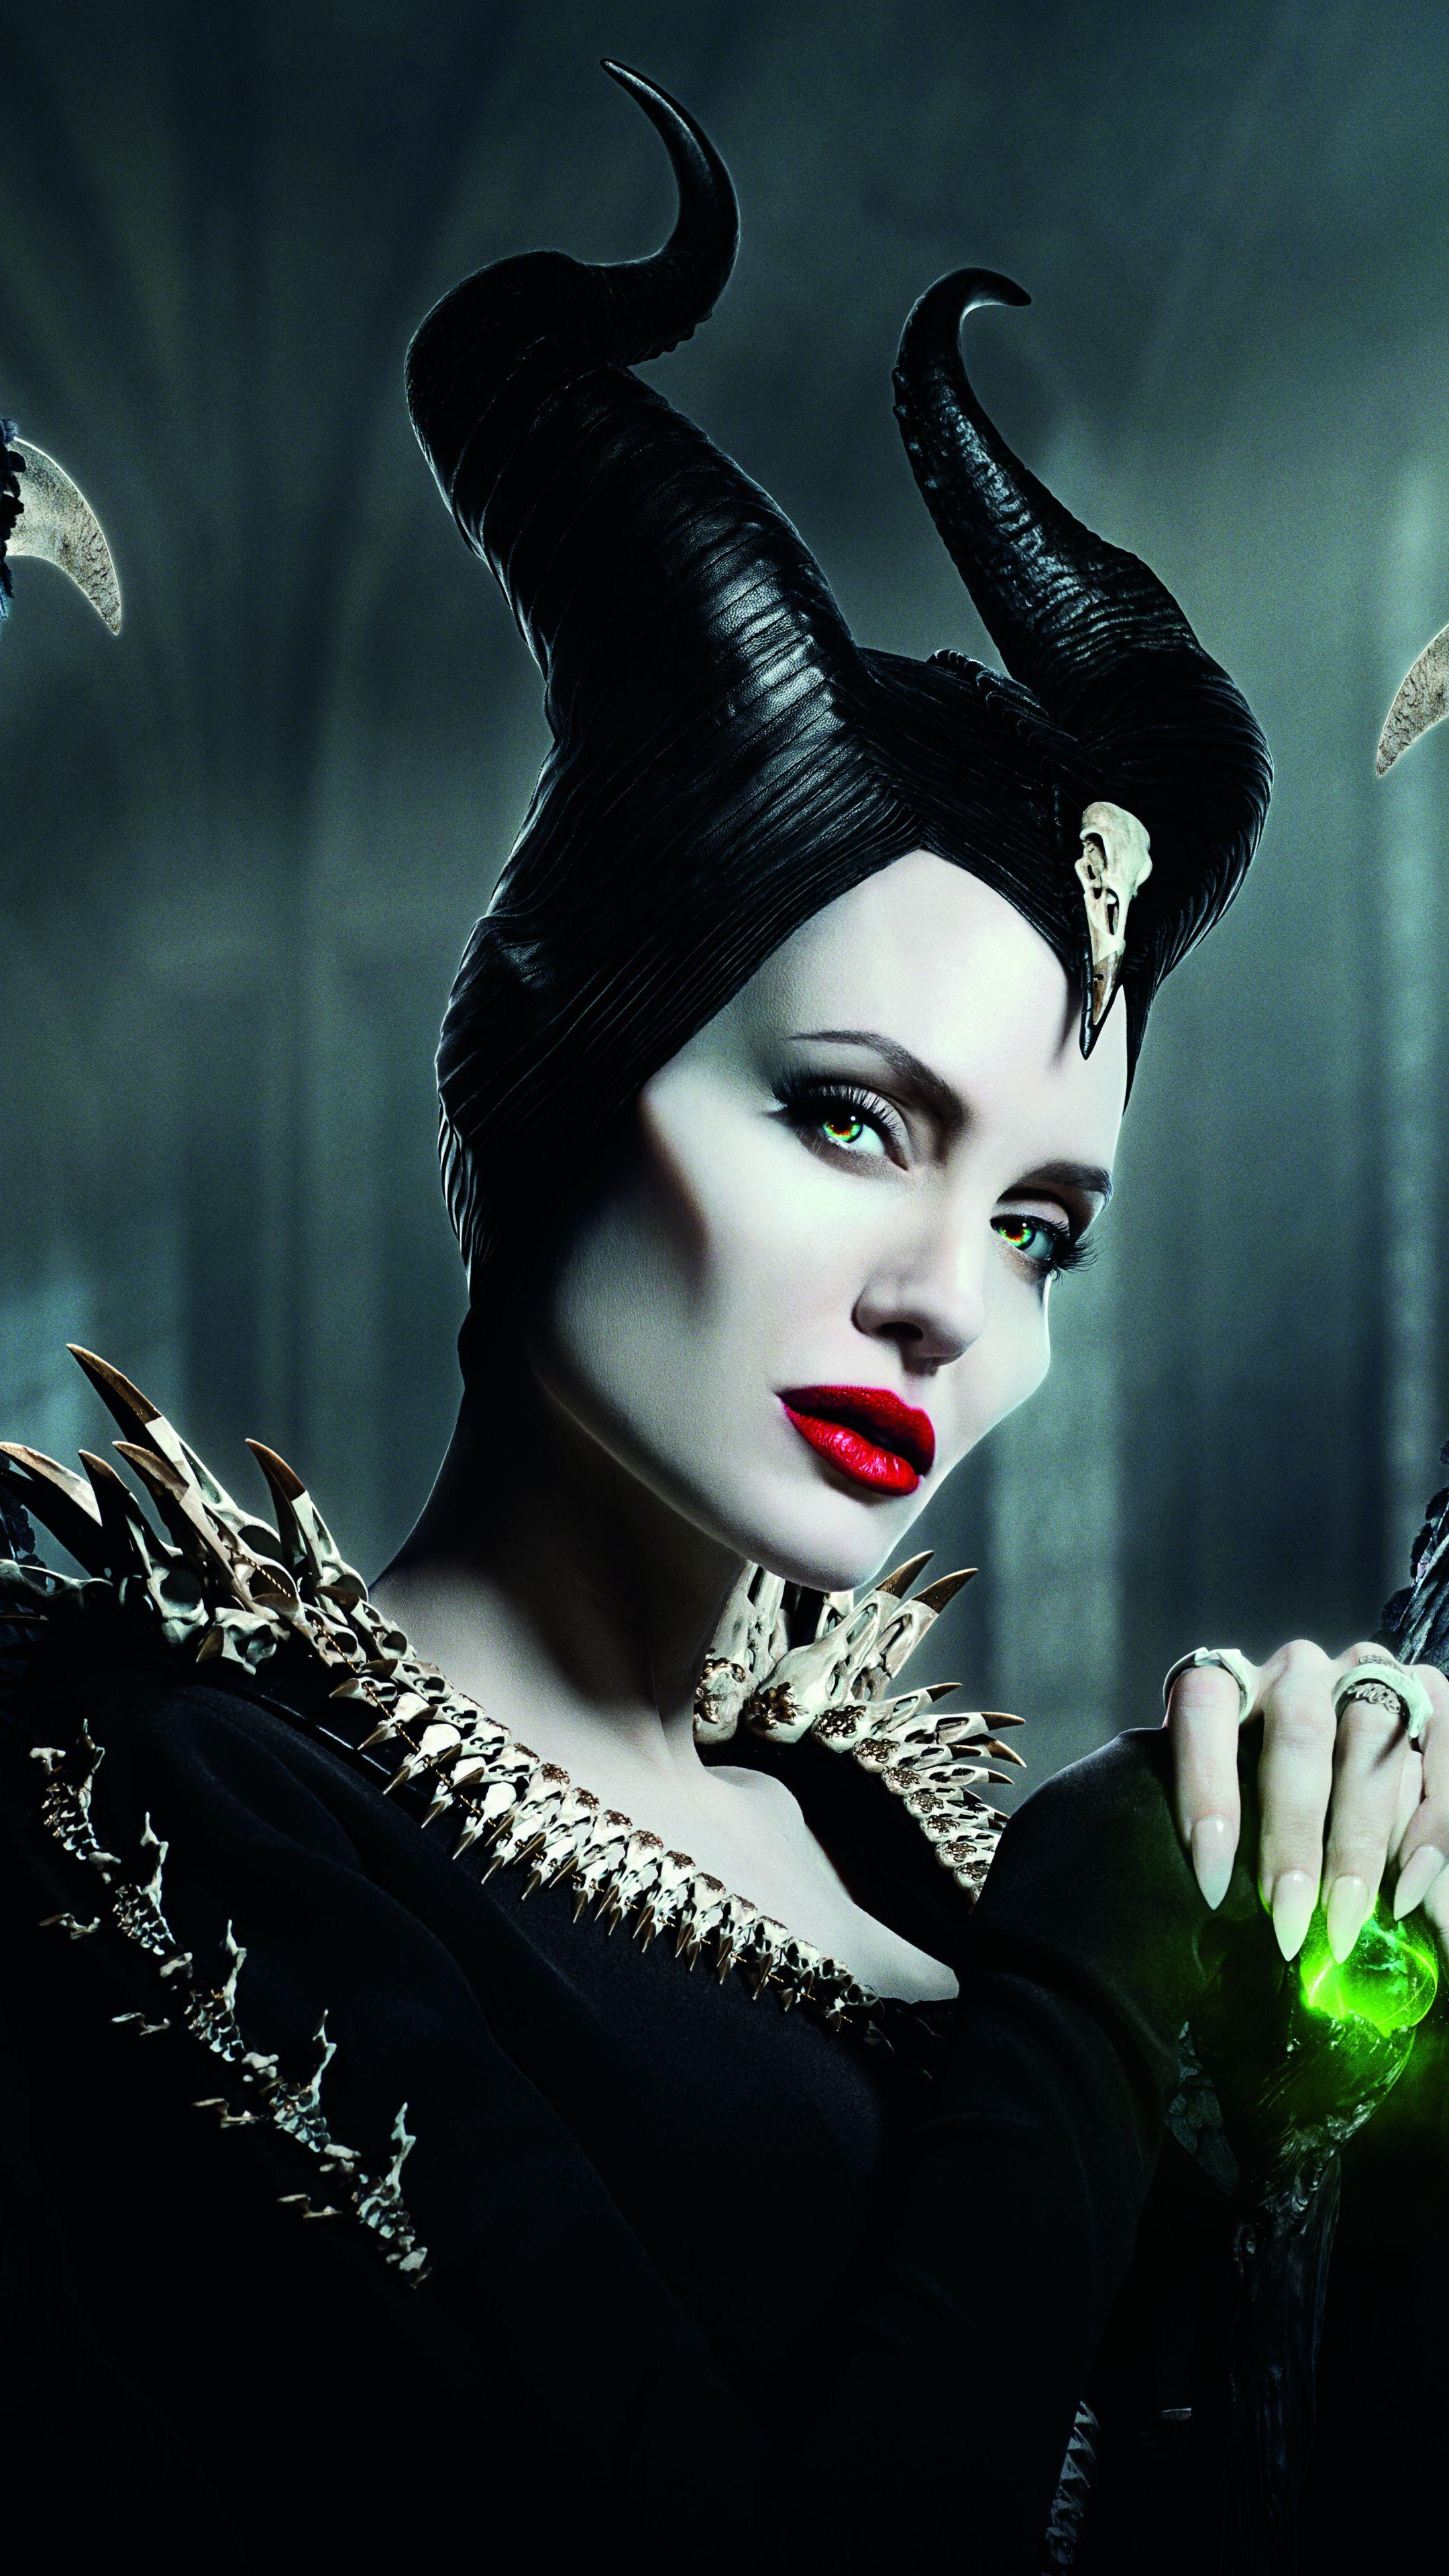 Maleficent: Mistress of Evil, witch, Angelina Jolie, 2019, 2160x3840 wallpaper